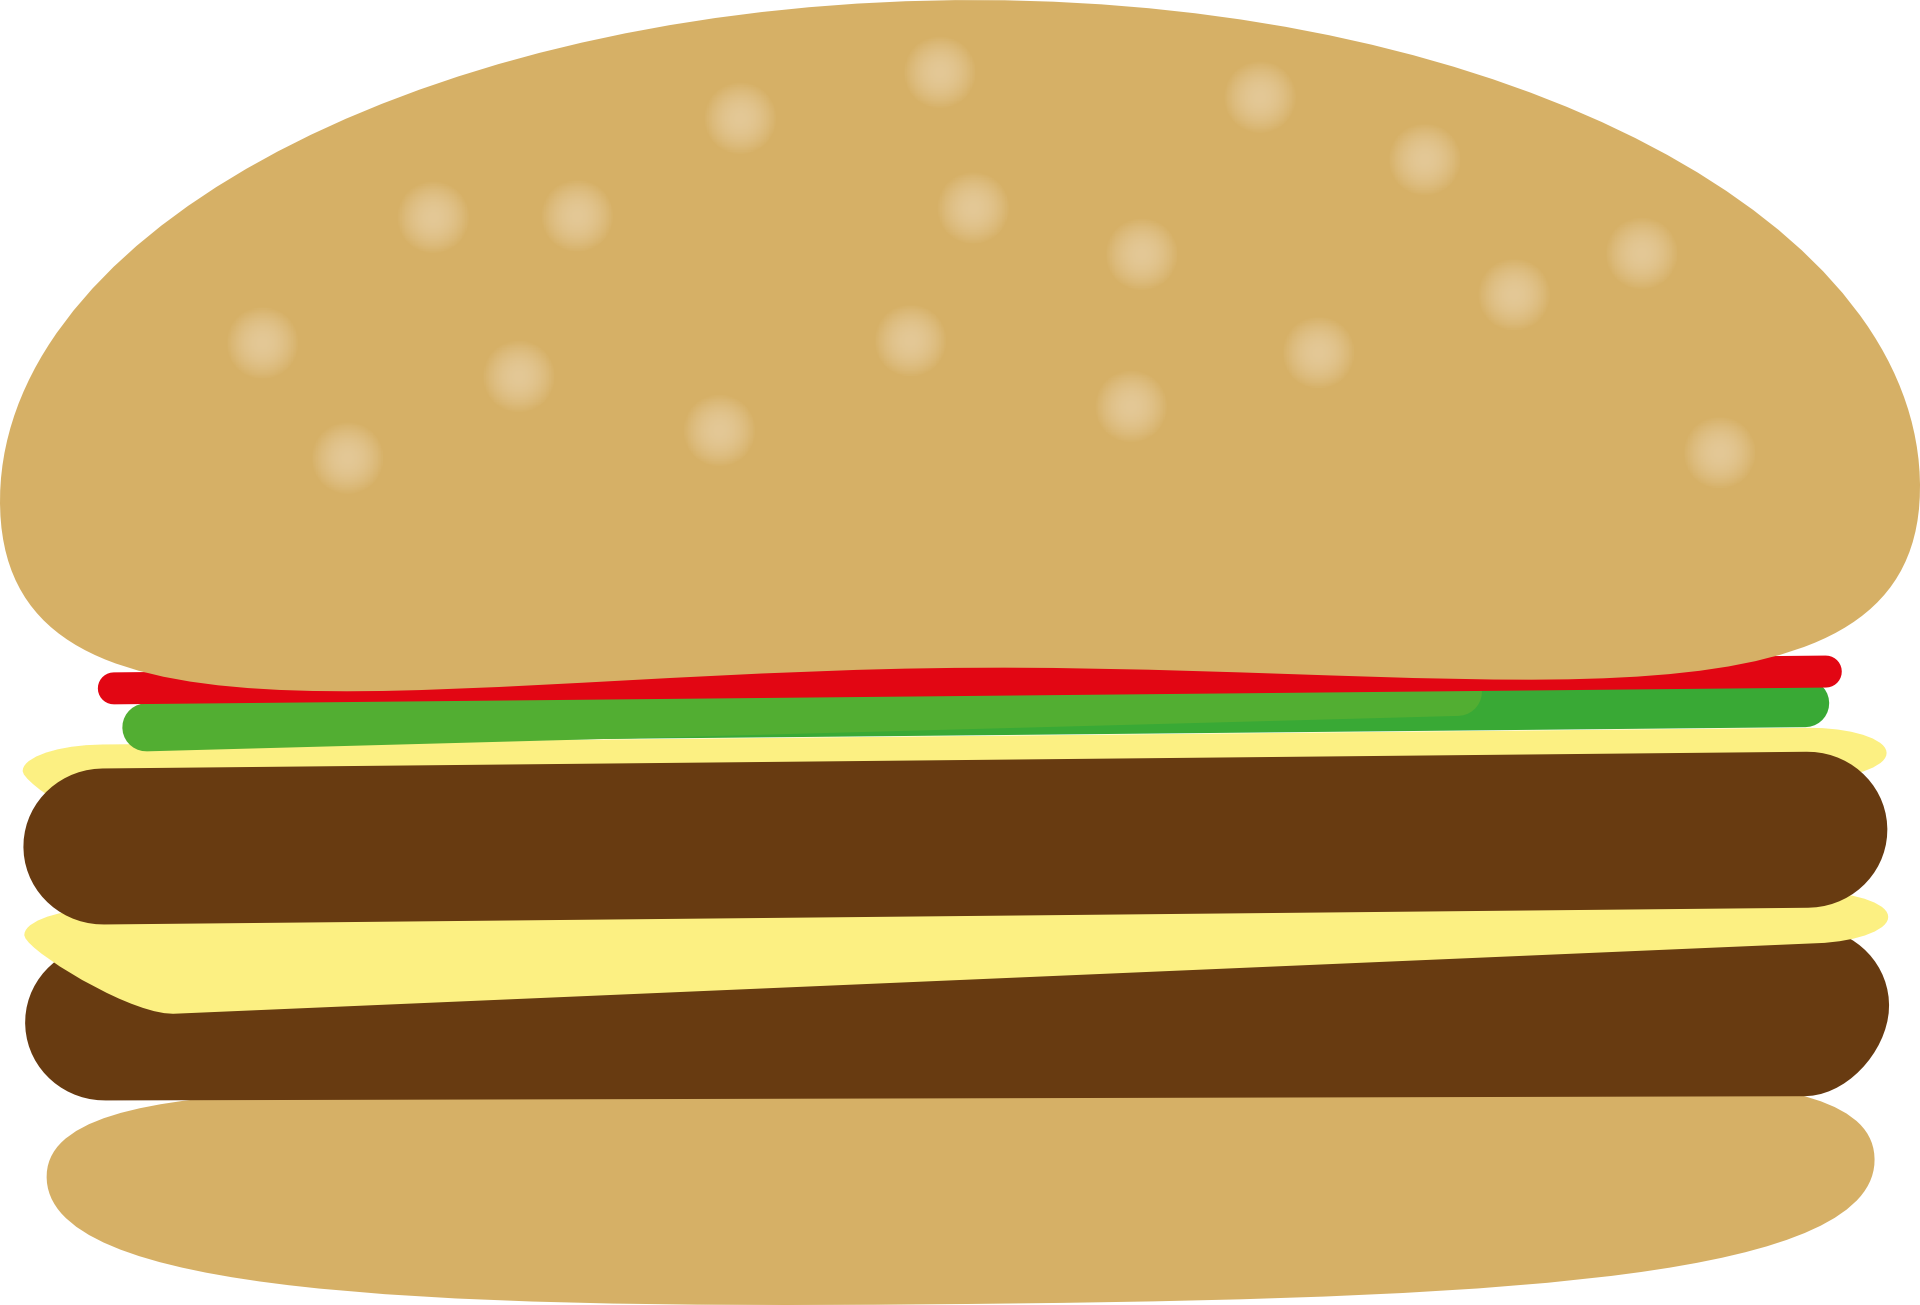 Food clipart hamburger. Fast hot dog french